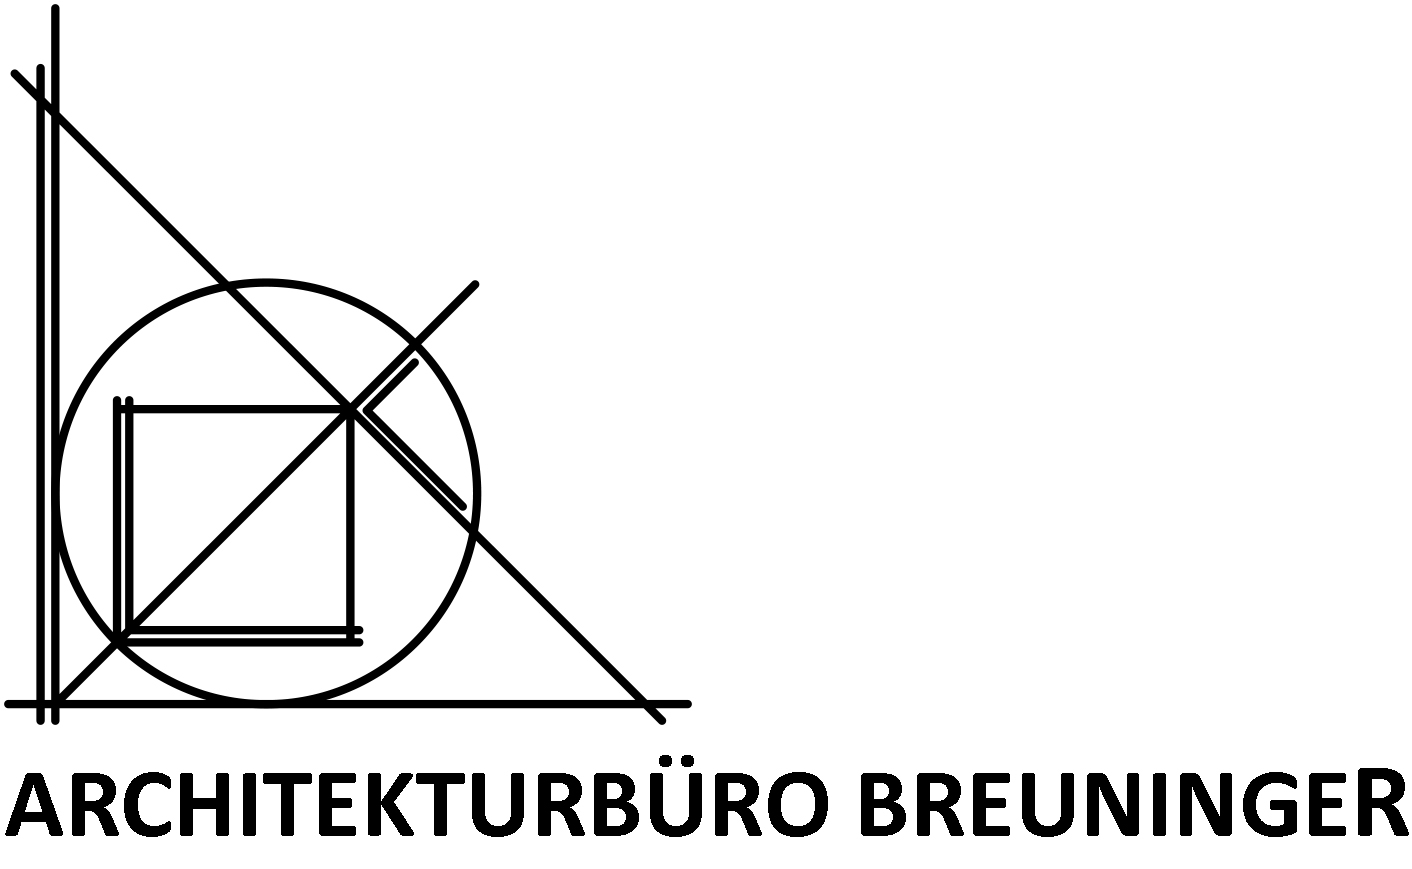 Architekturbüro Breuninger